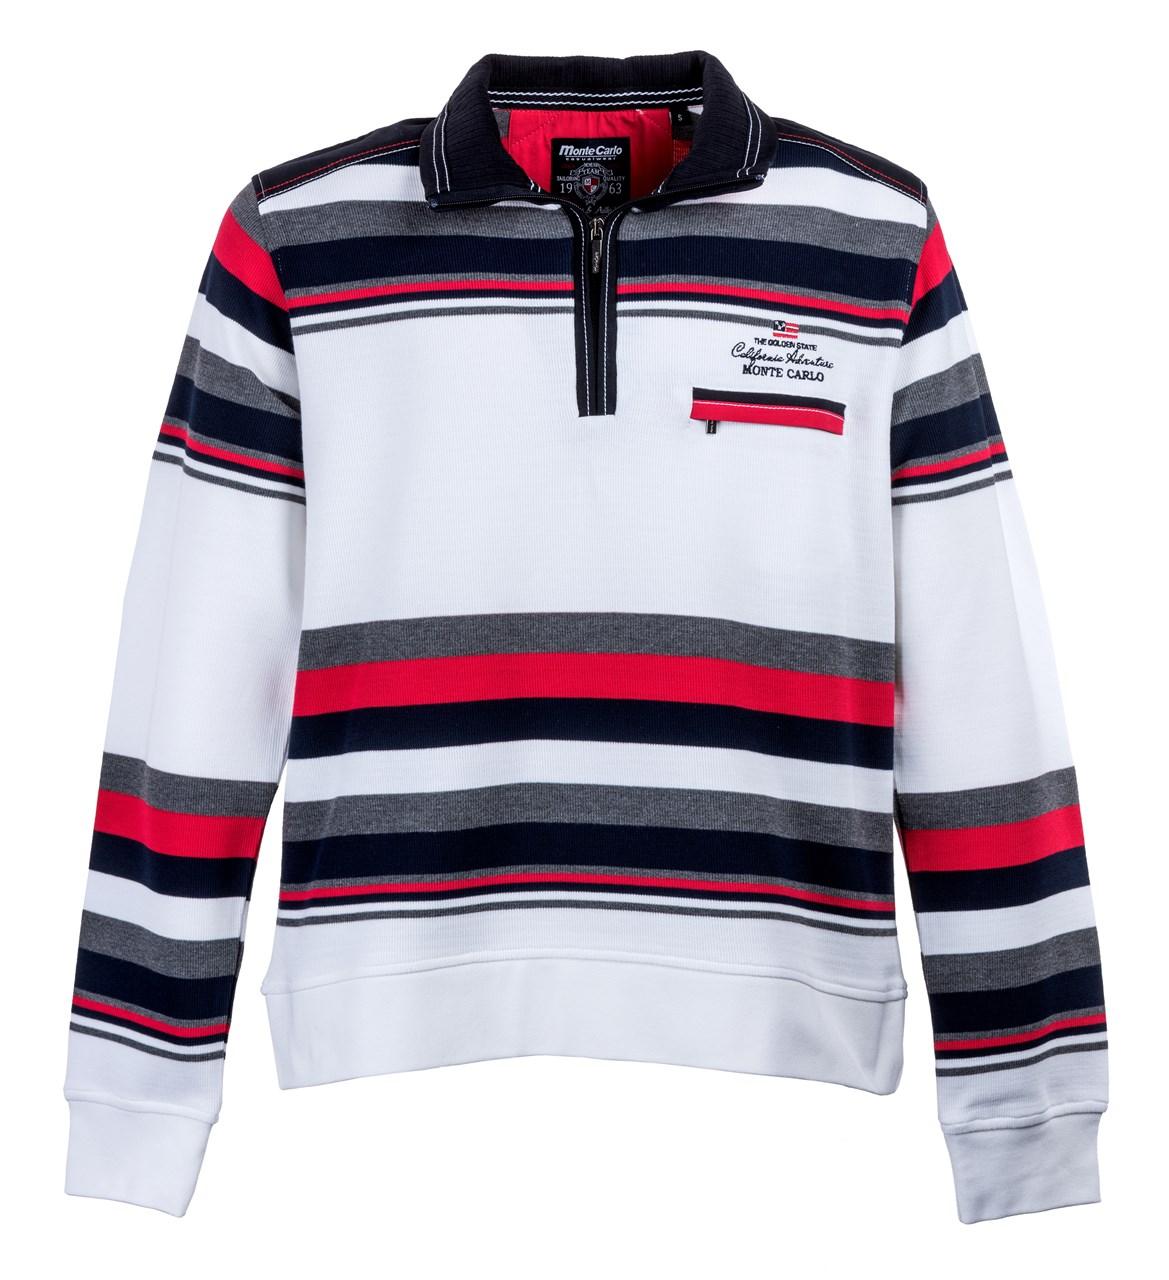 3576f52677d Mode Monte Carlo. Obrázek E Bílá šedá červená modrá mikina s pruhy